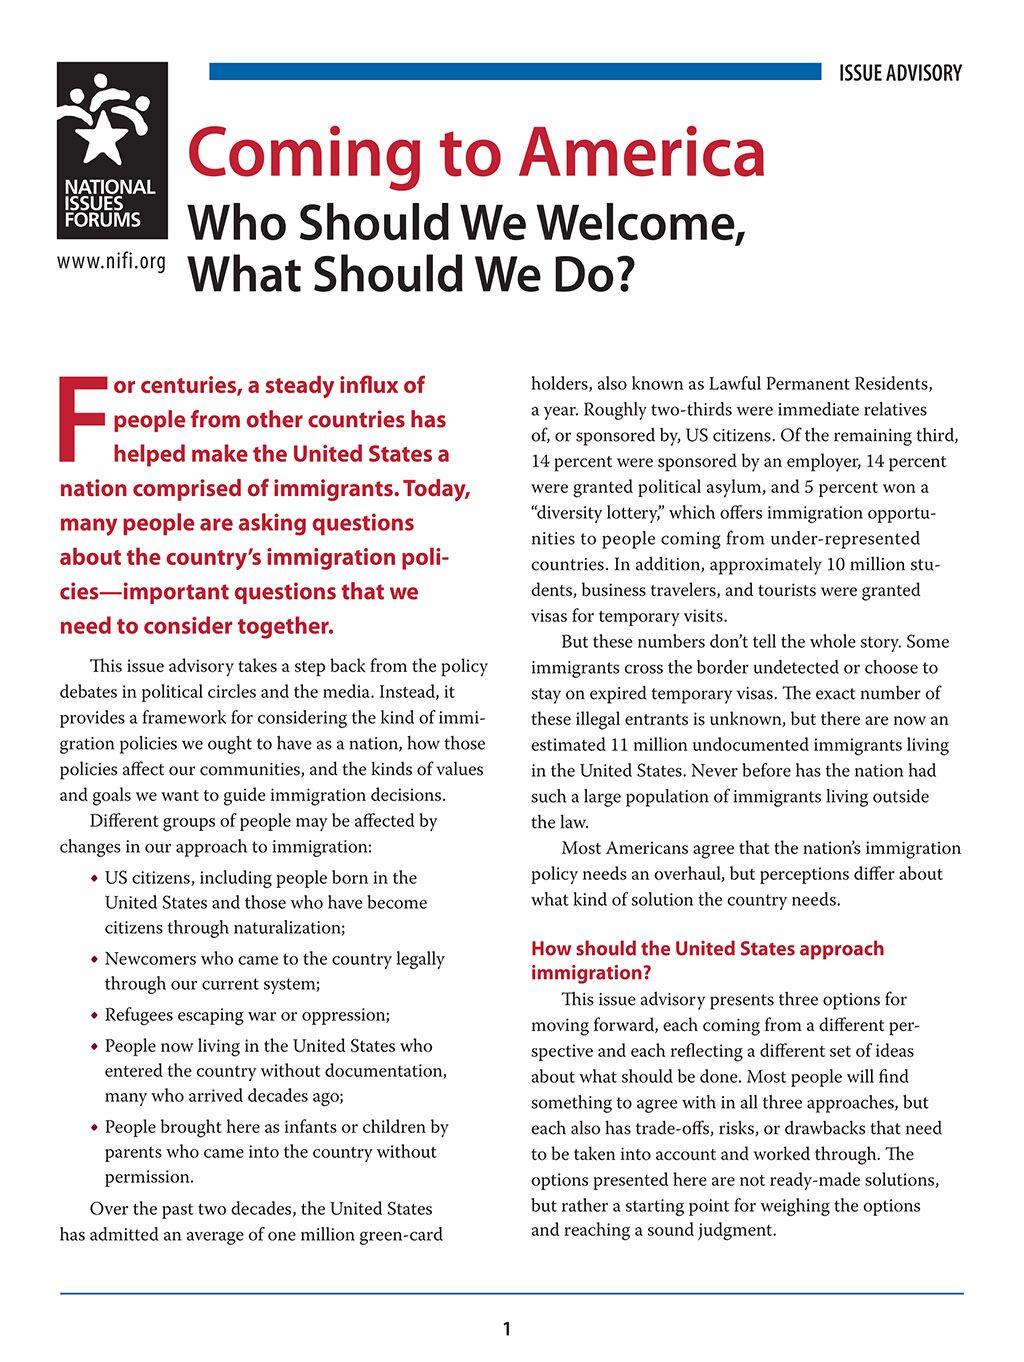 Immigration issue advisory